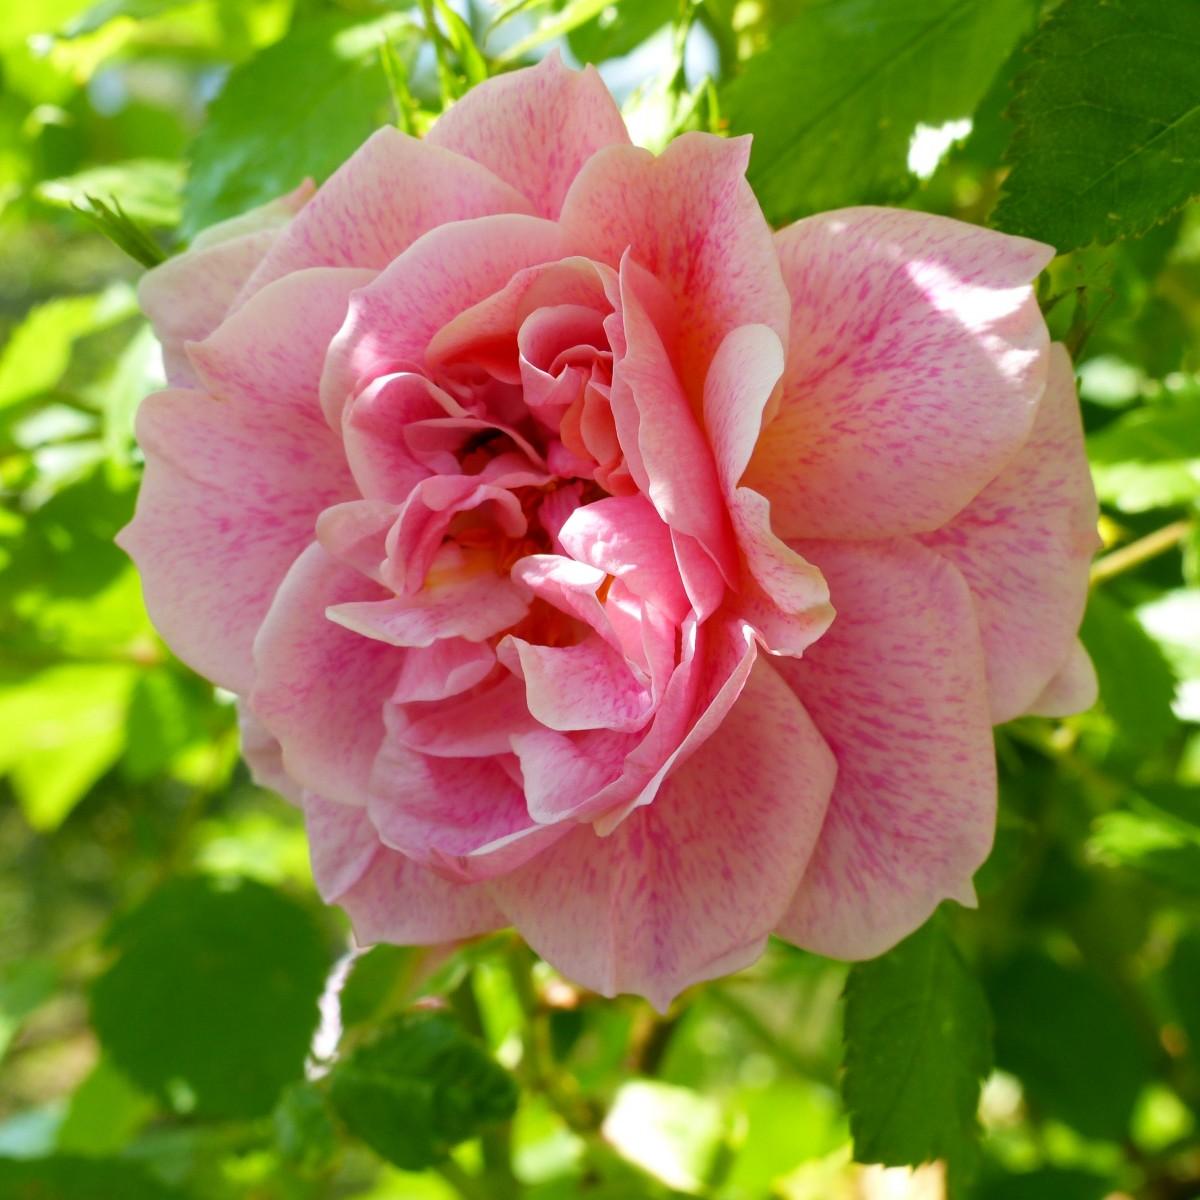 Free Images : Flower, Purple, Petal, Summer, Pink, Flora